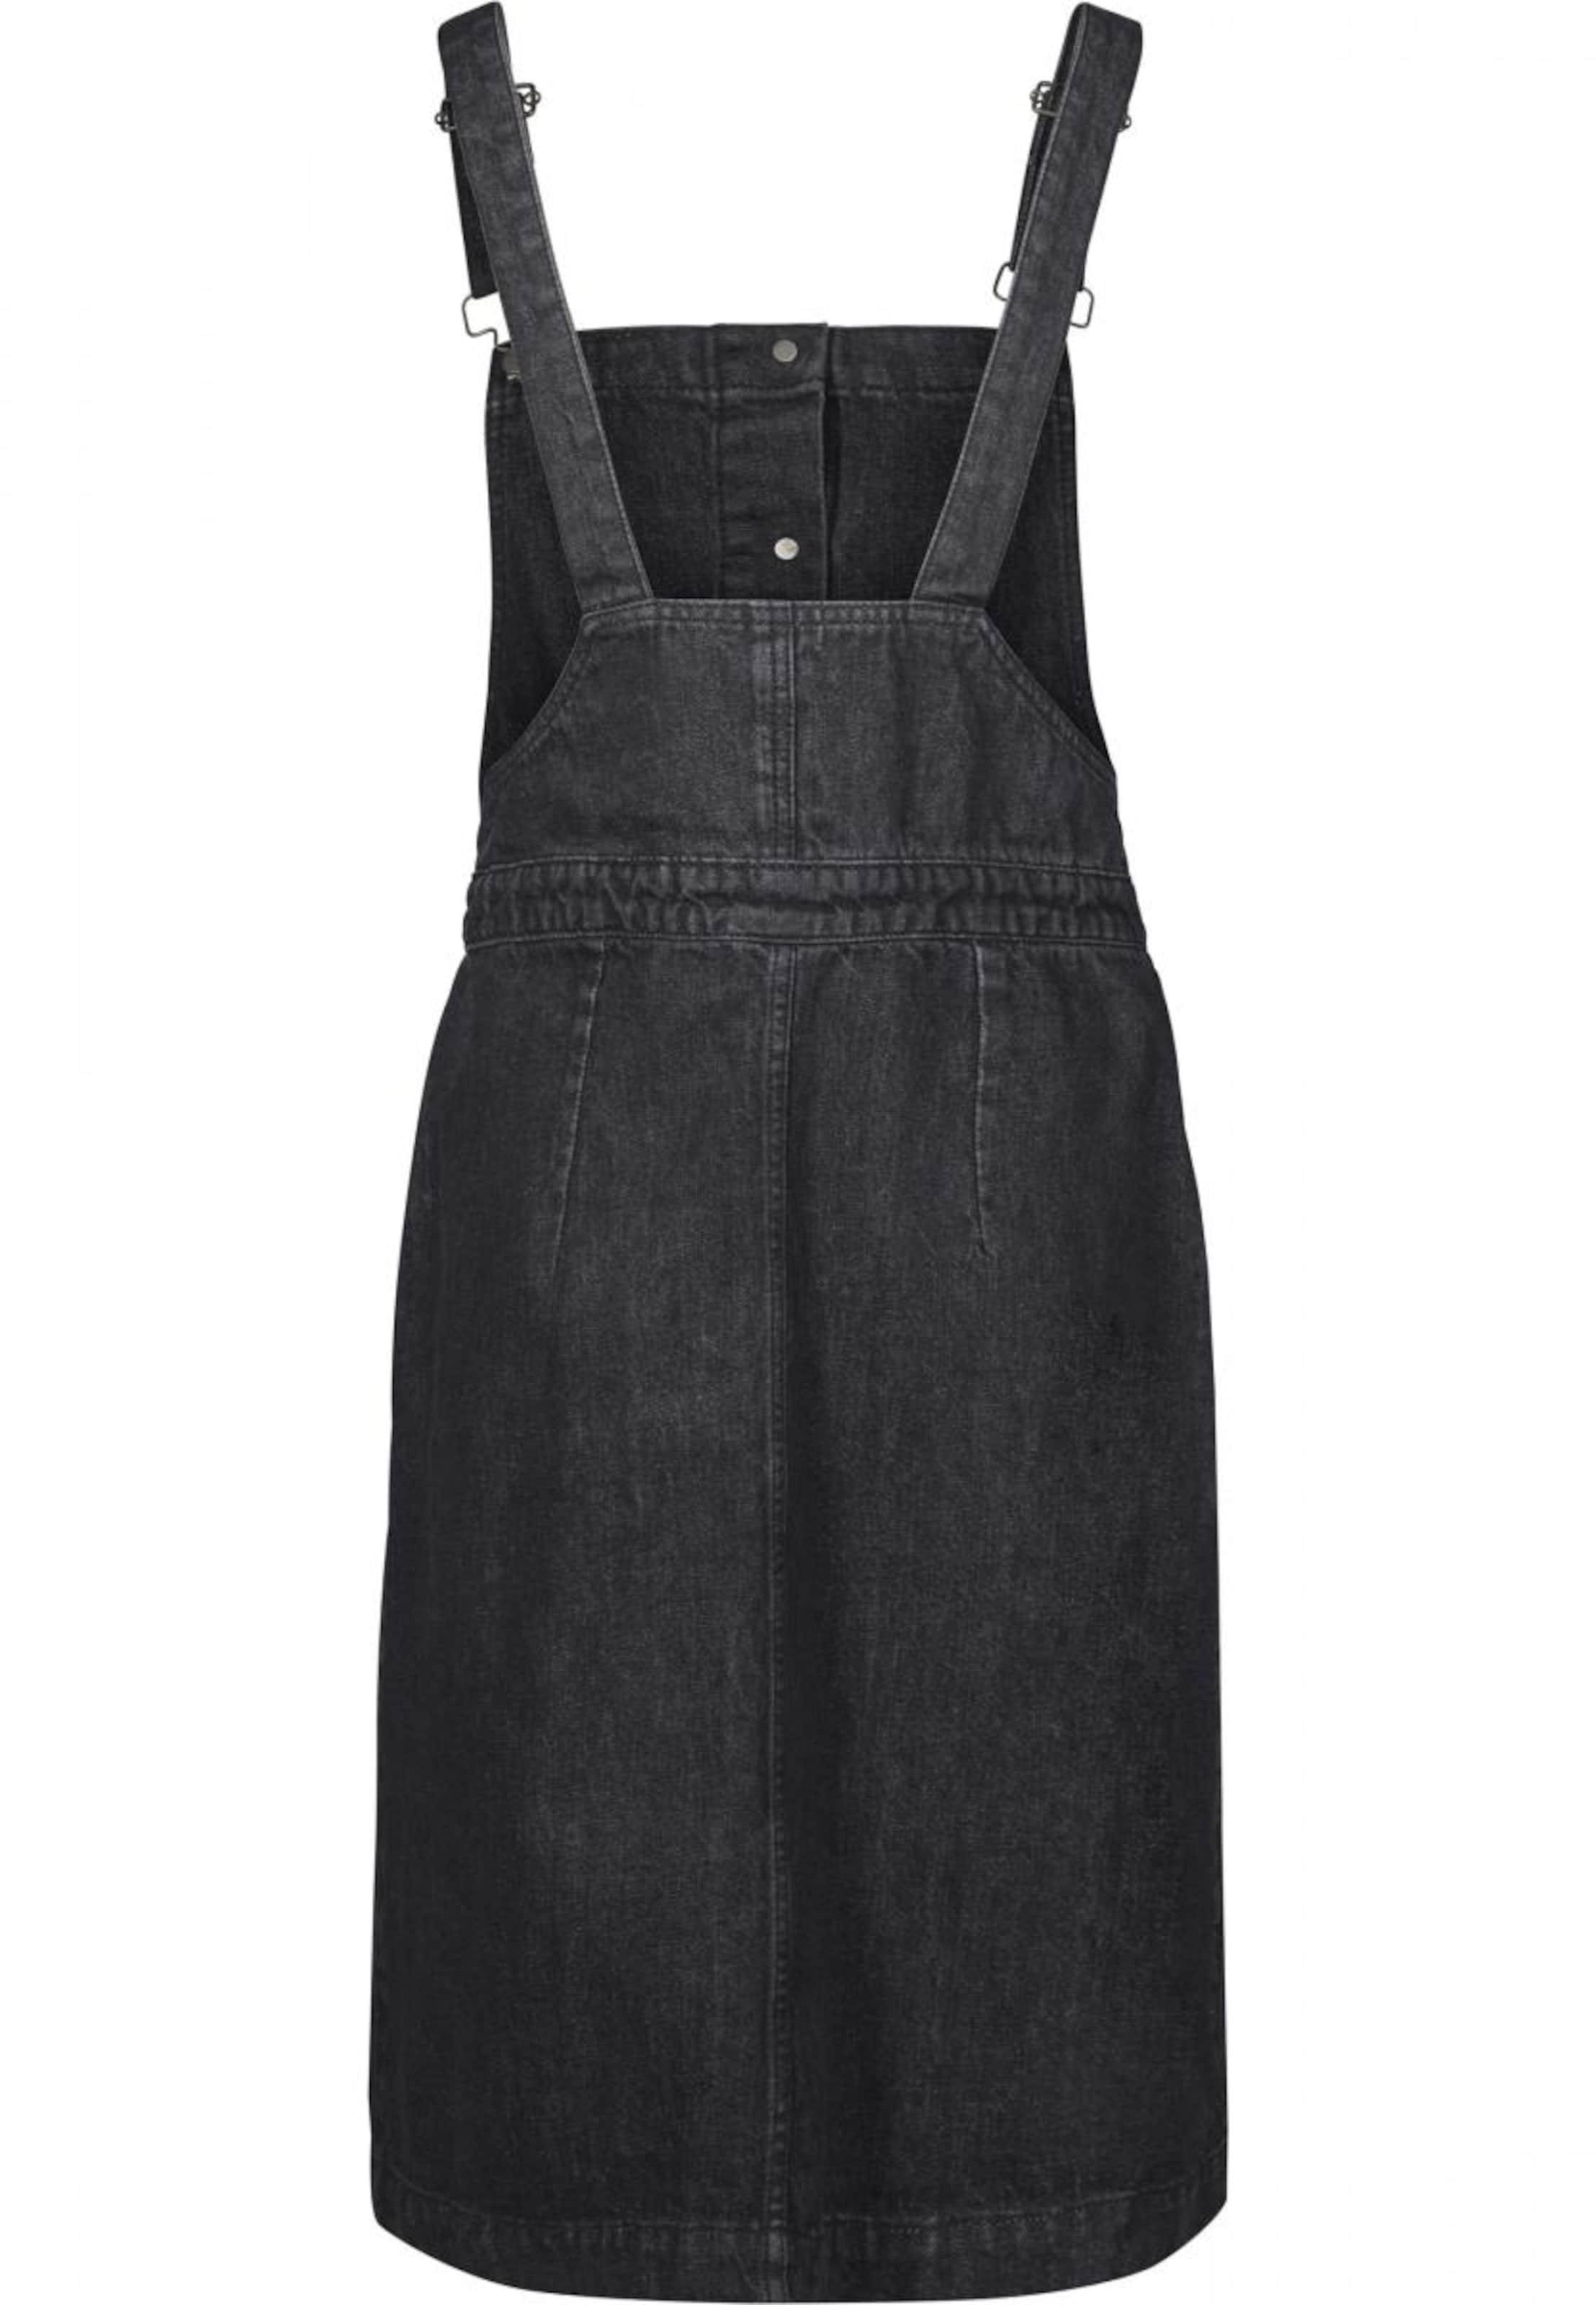 In Classics Urban Denim Black Dungarees Dress 8NwPkn0OX